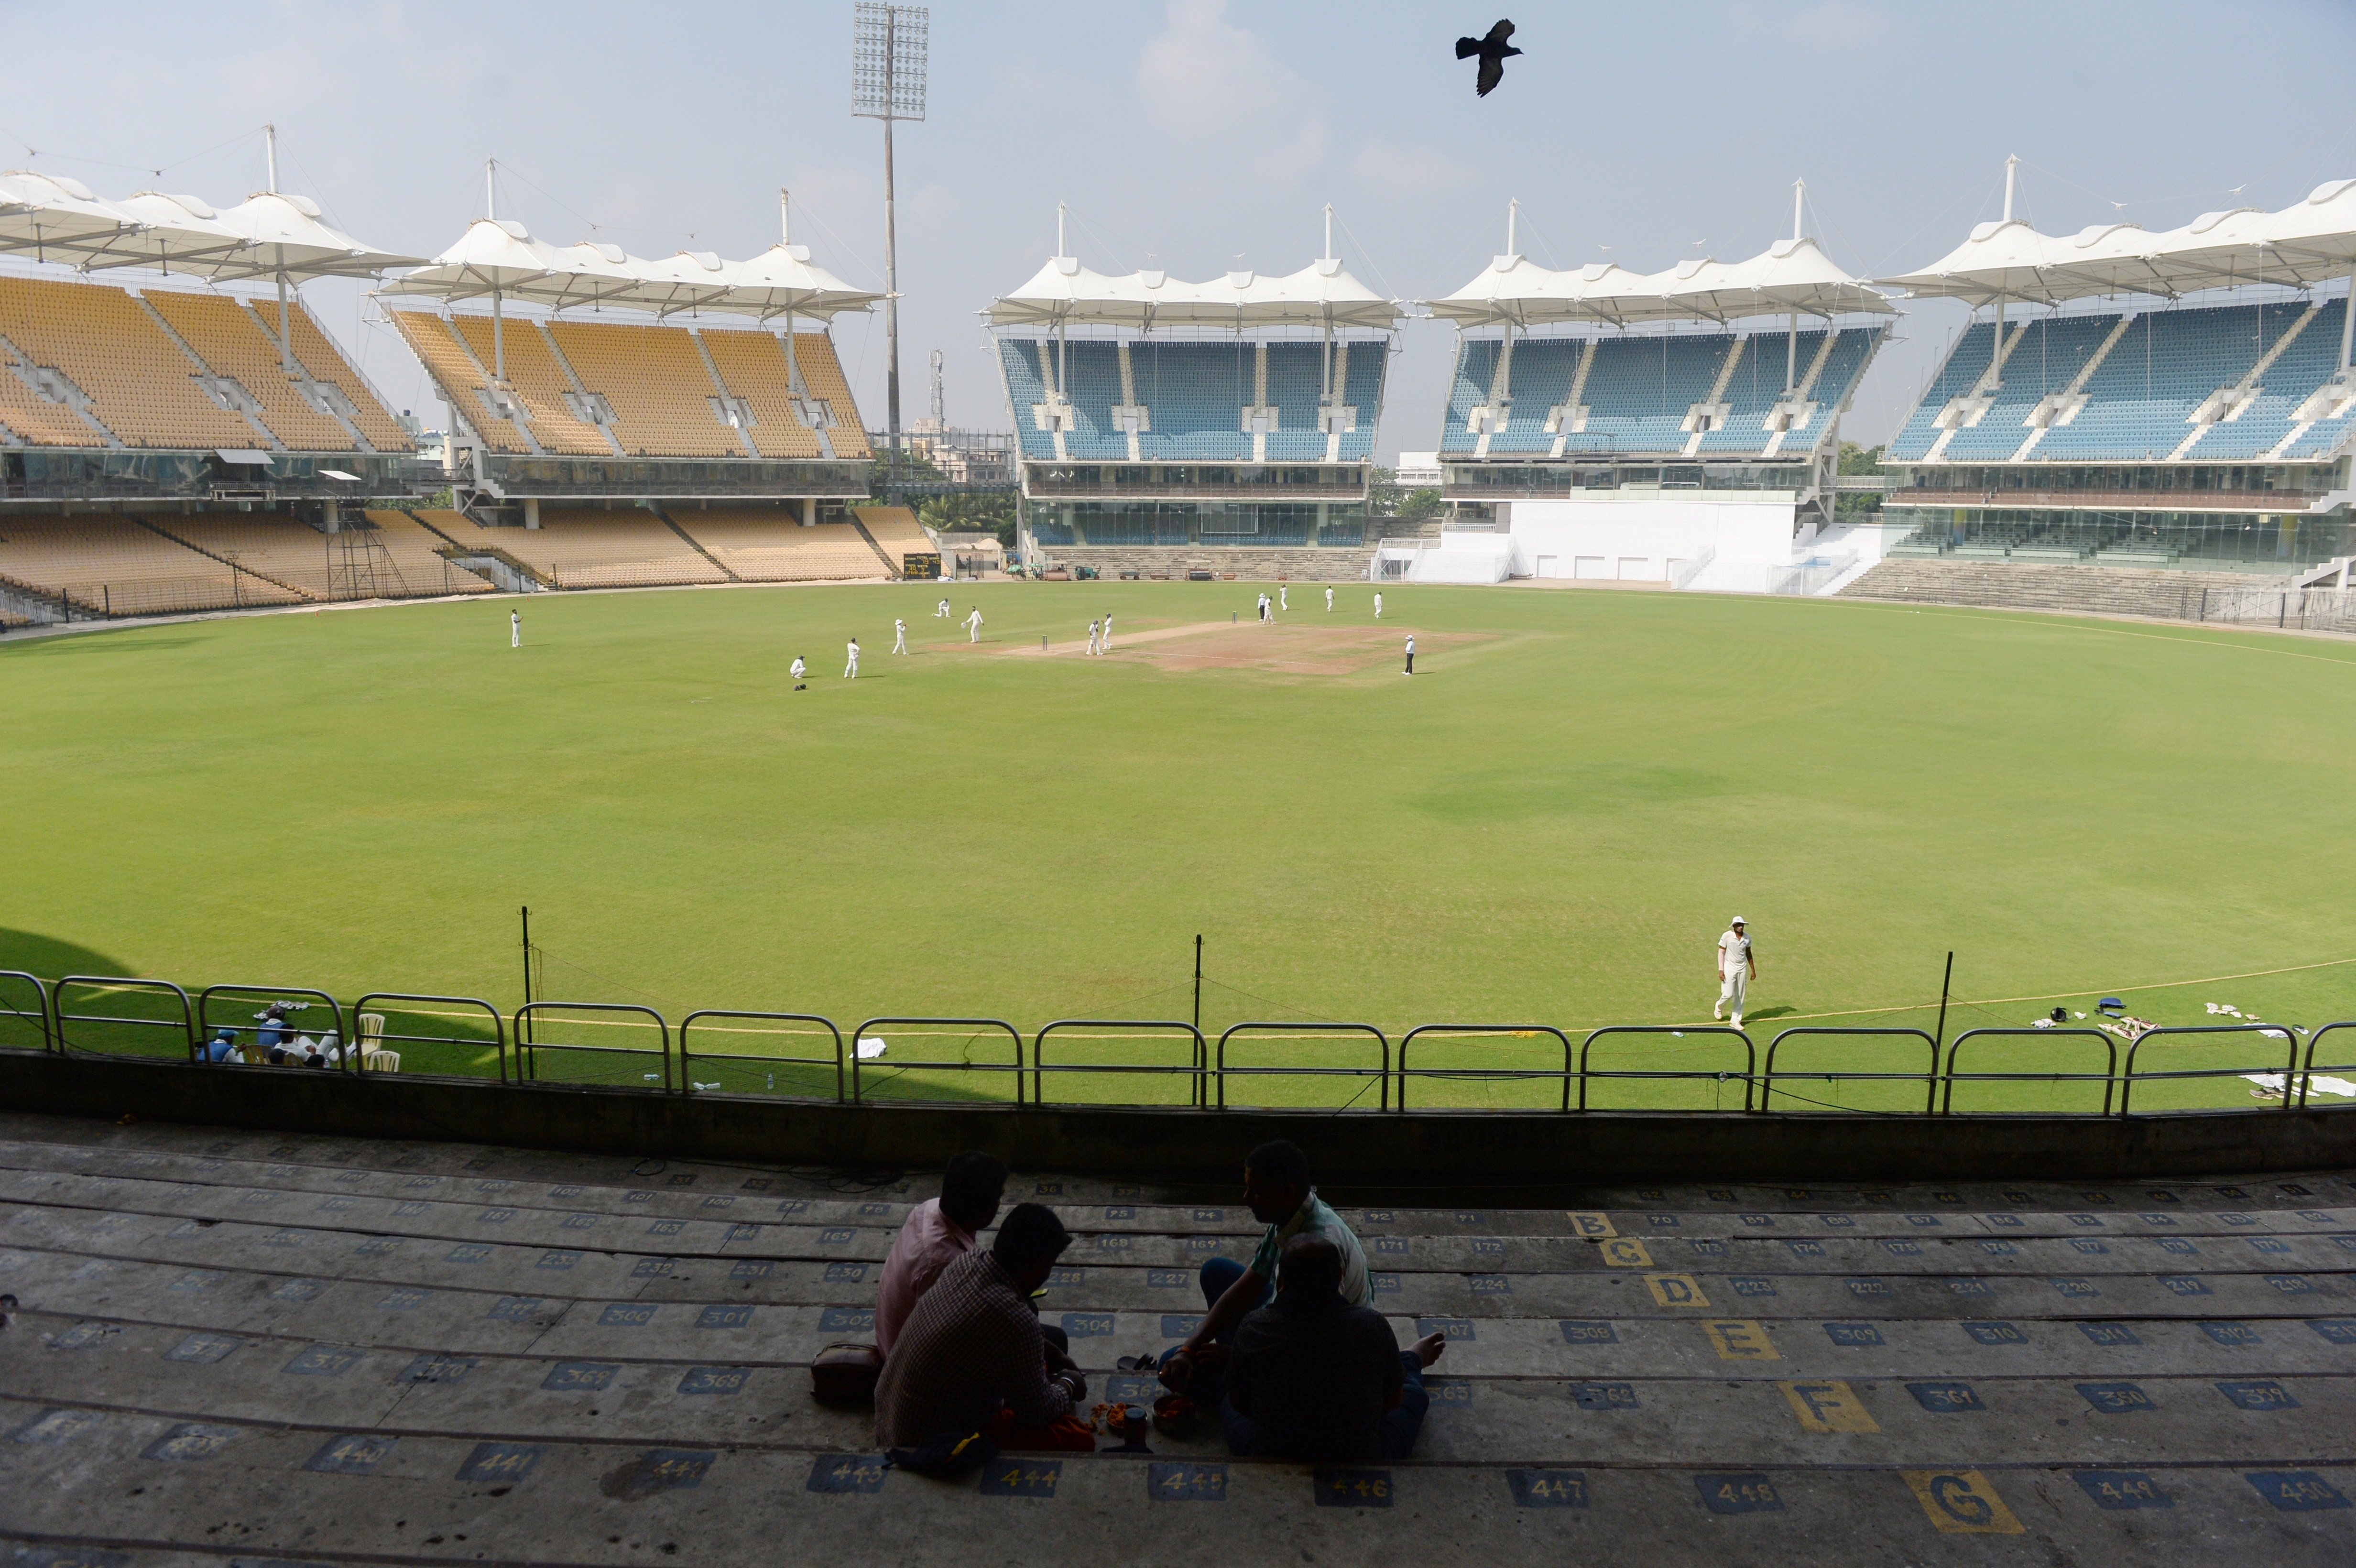 IPL 2019 Cricket Grounds, Venues List| List of Cricket